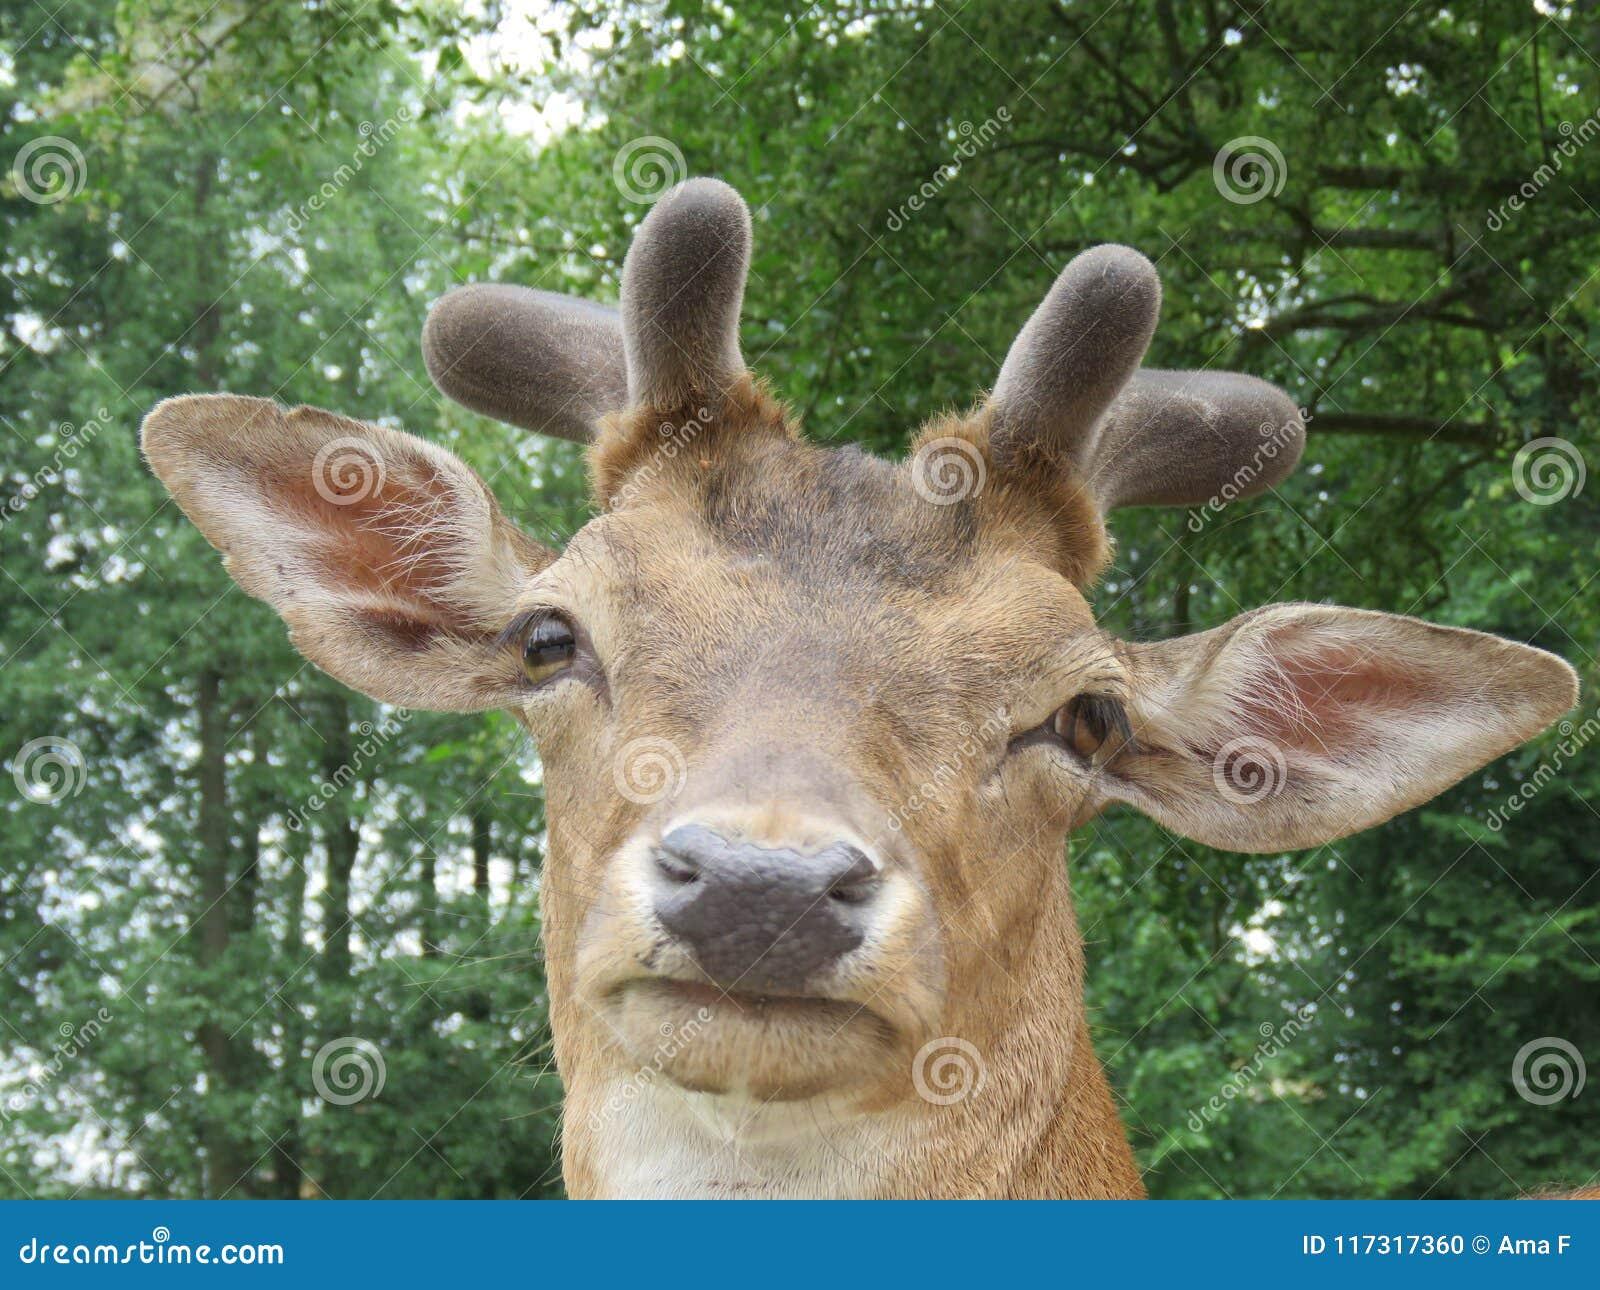 Fallow-deer Dama dama looks directly into the camera lens.